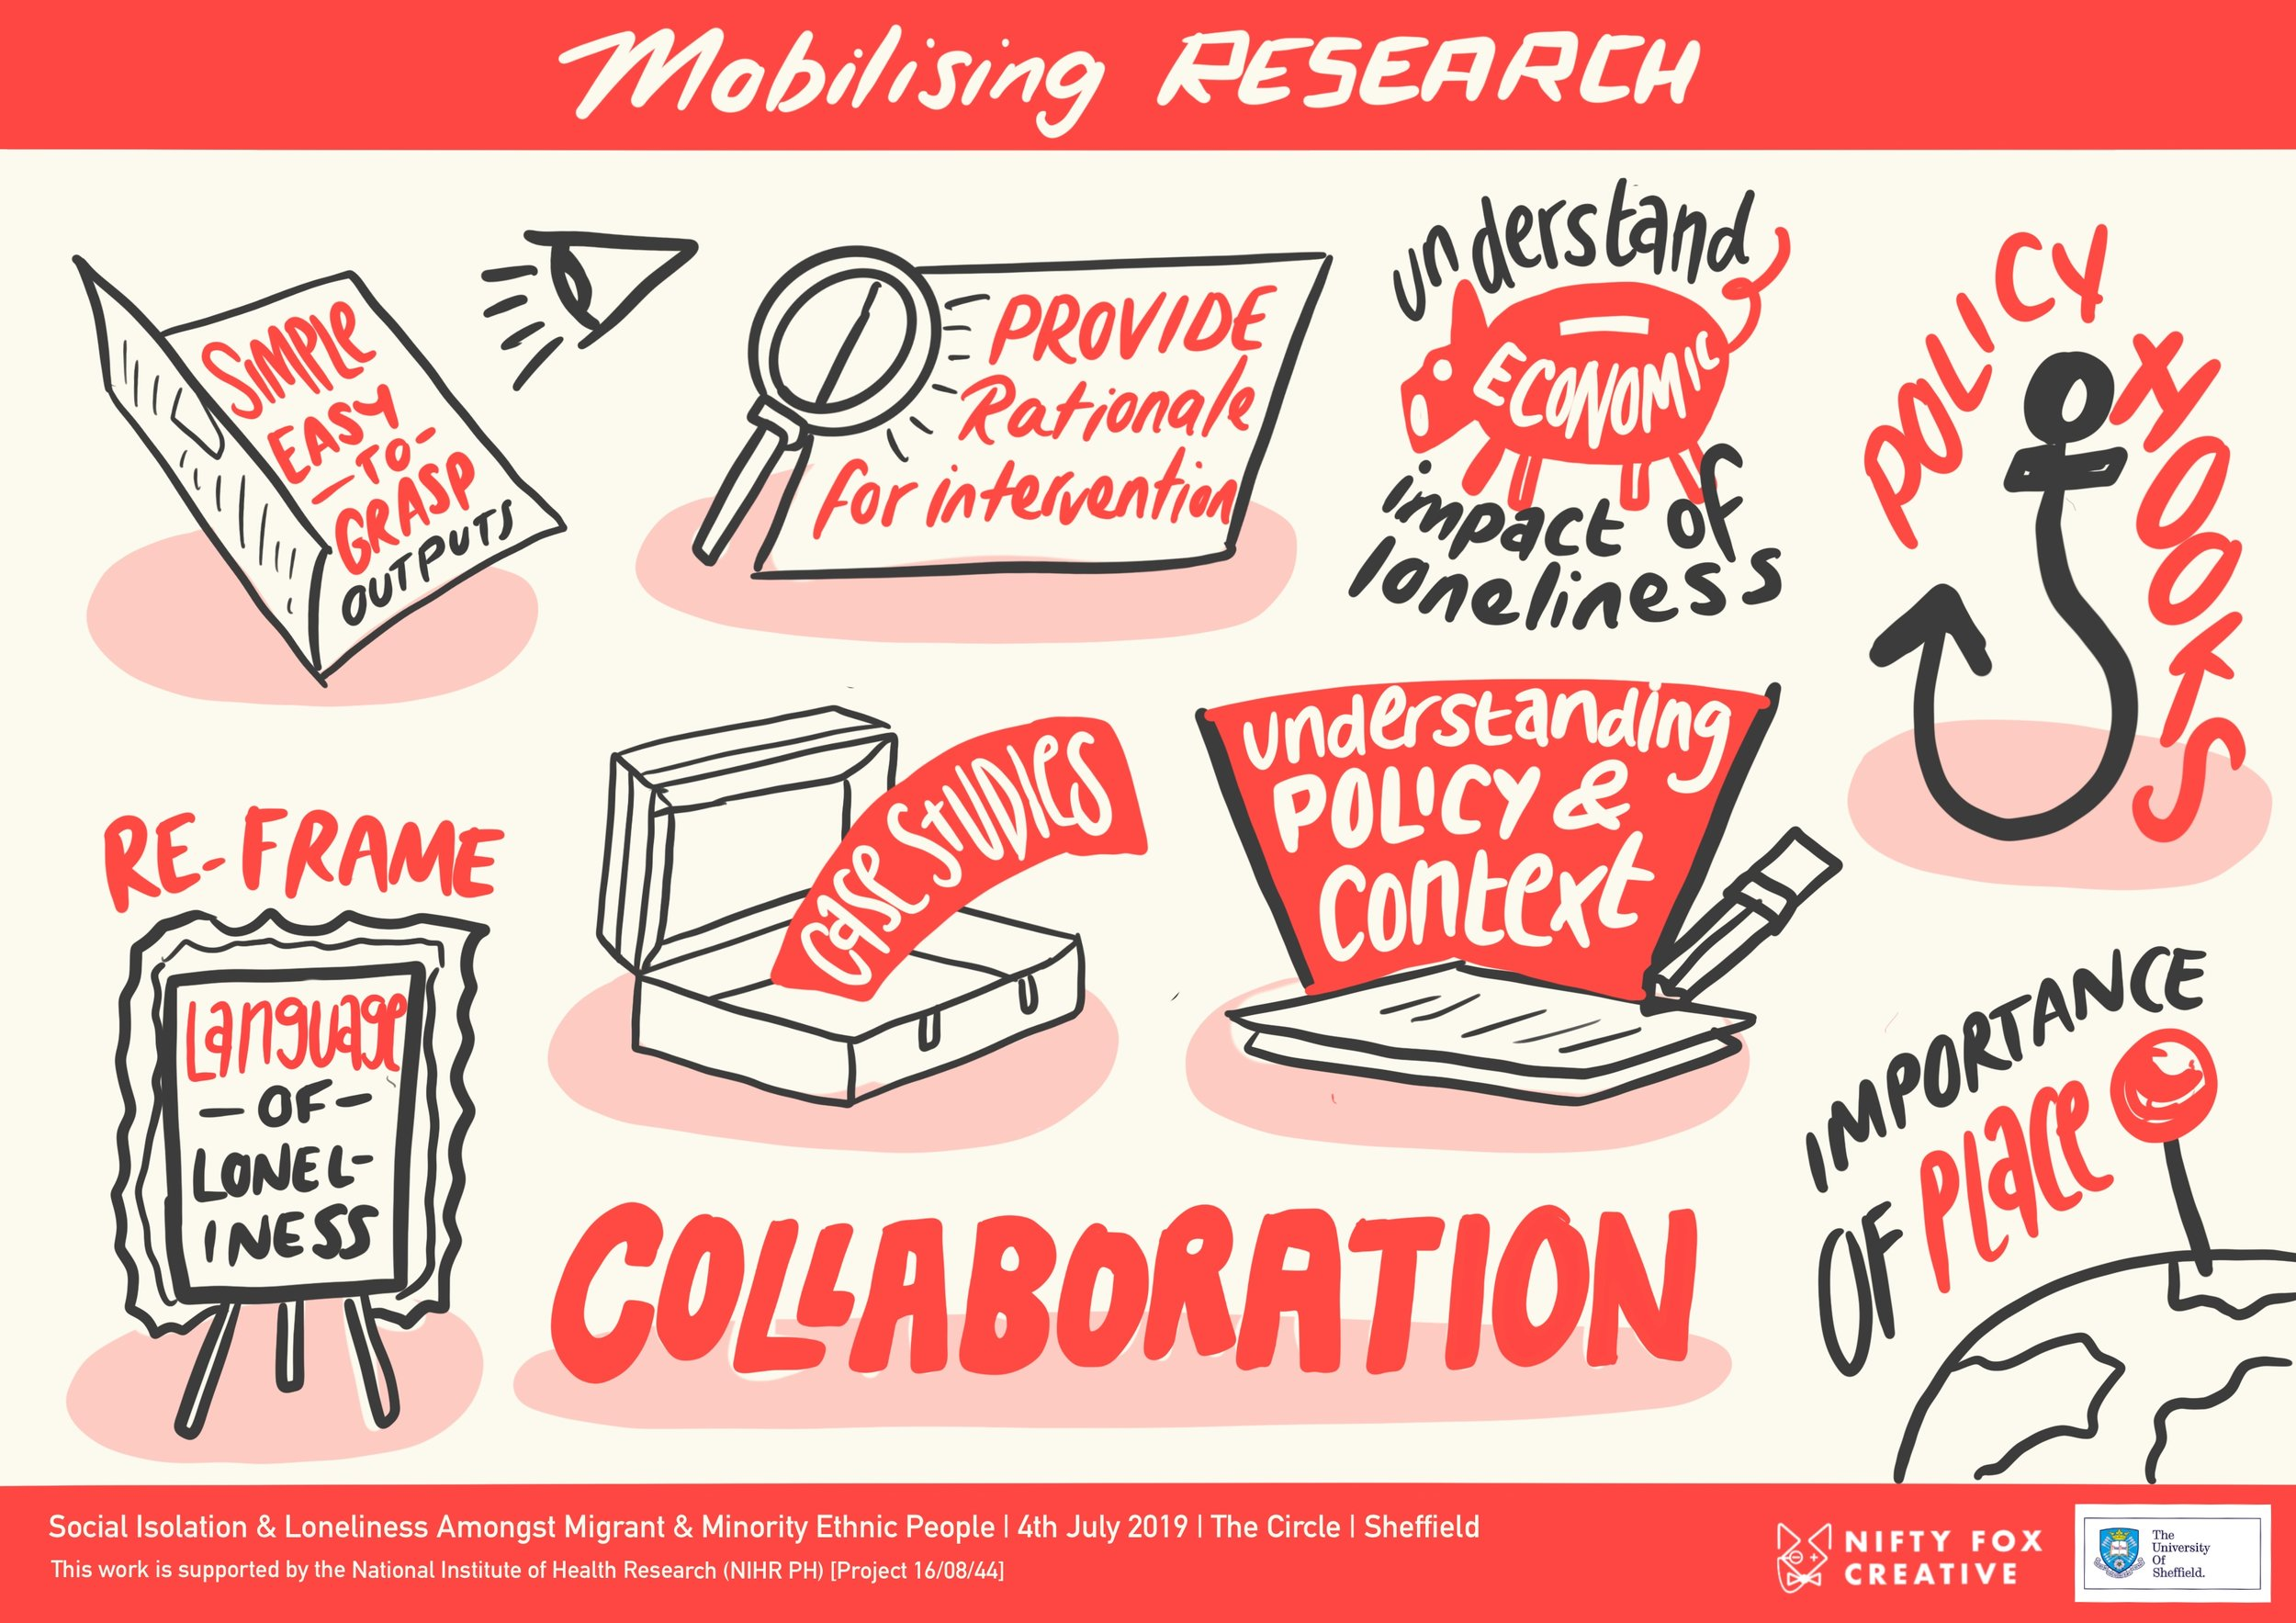 Mobilising Research.jpg